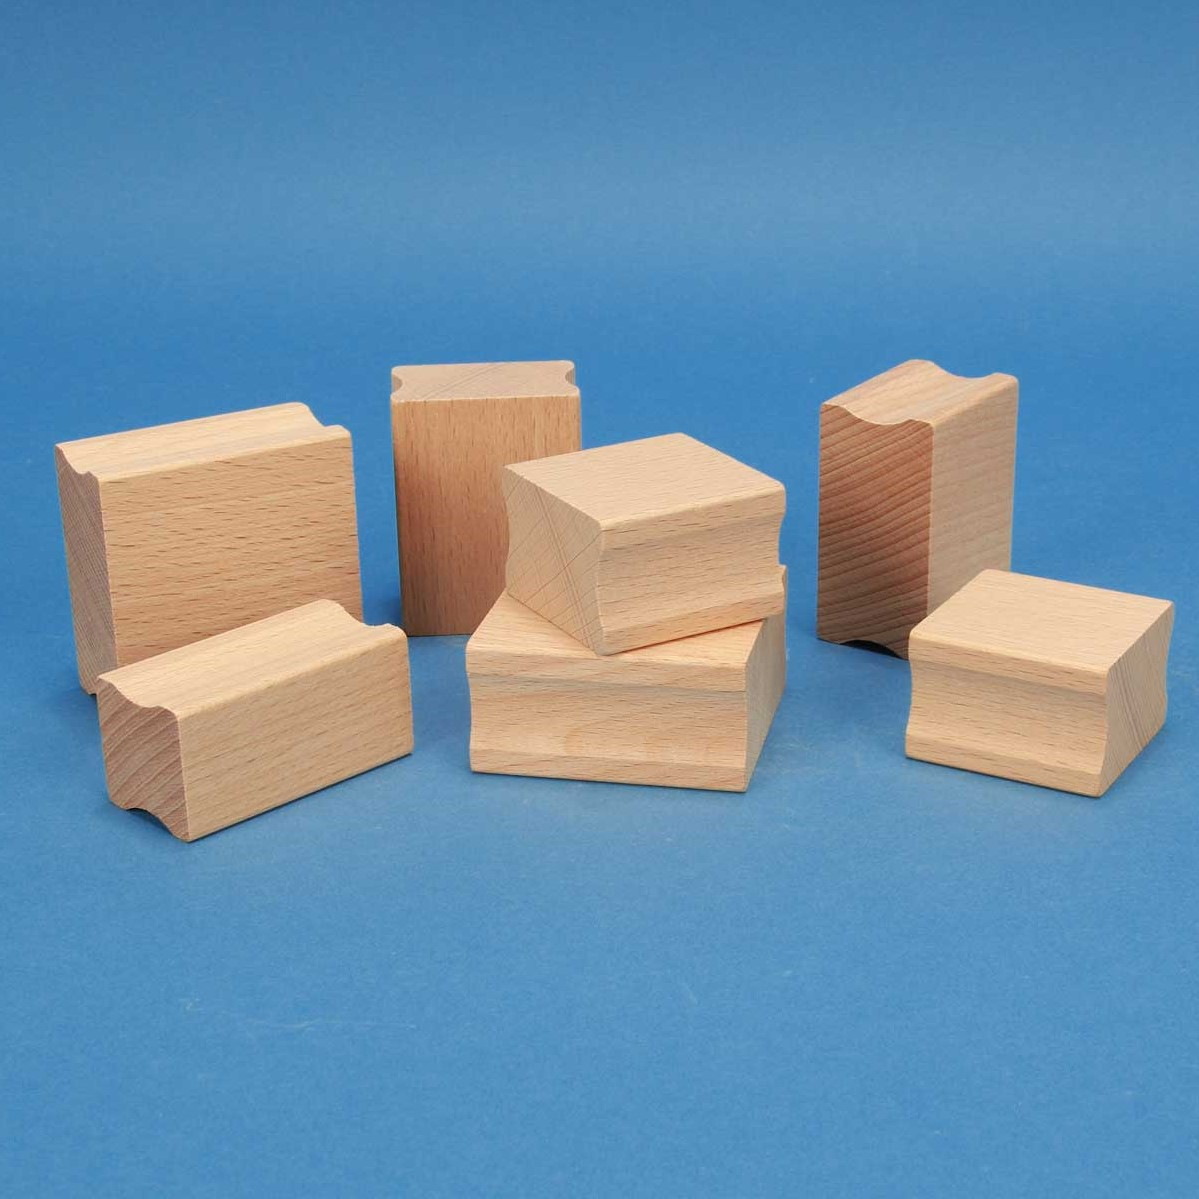 DIY-Wooden stamps